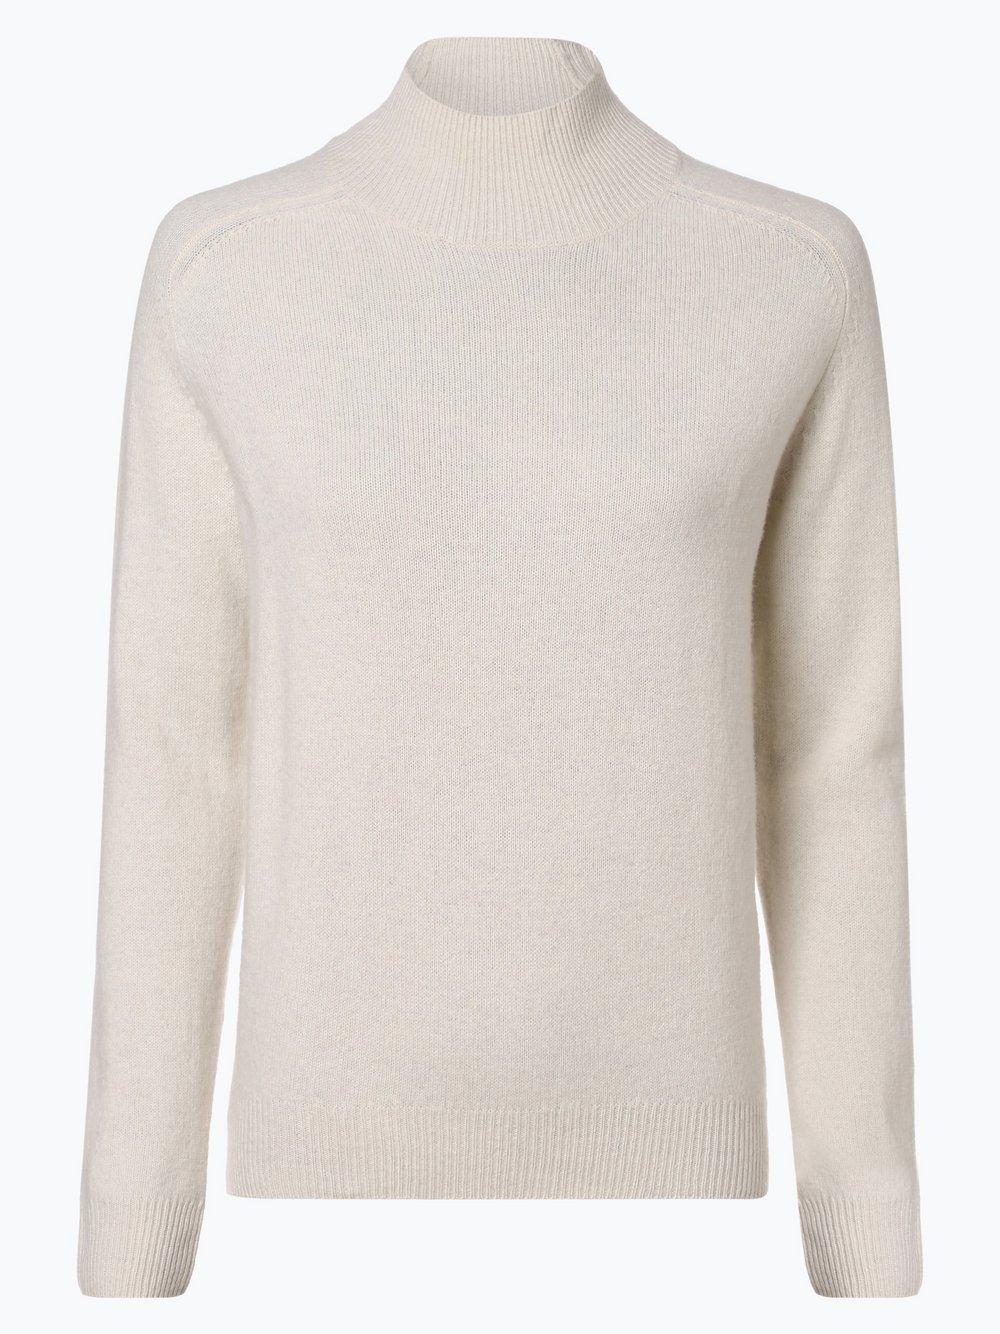 6725fd7f1725b7 Marie Lund Damski sweter z wełny merino kup online | VANGRAAF.COM